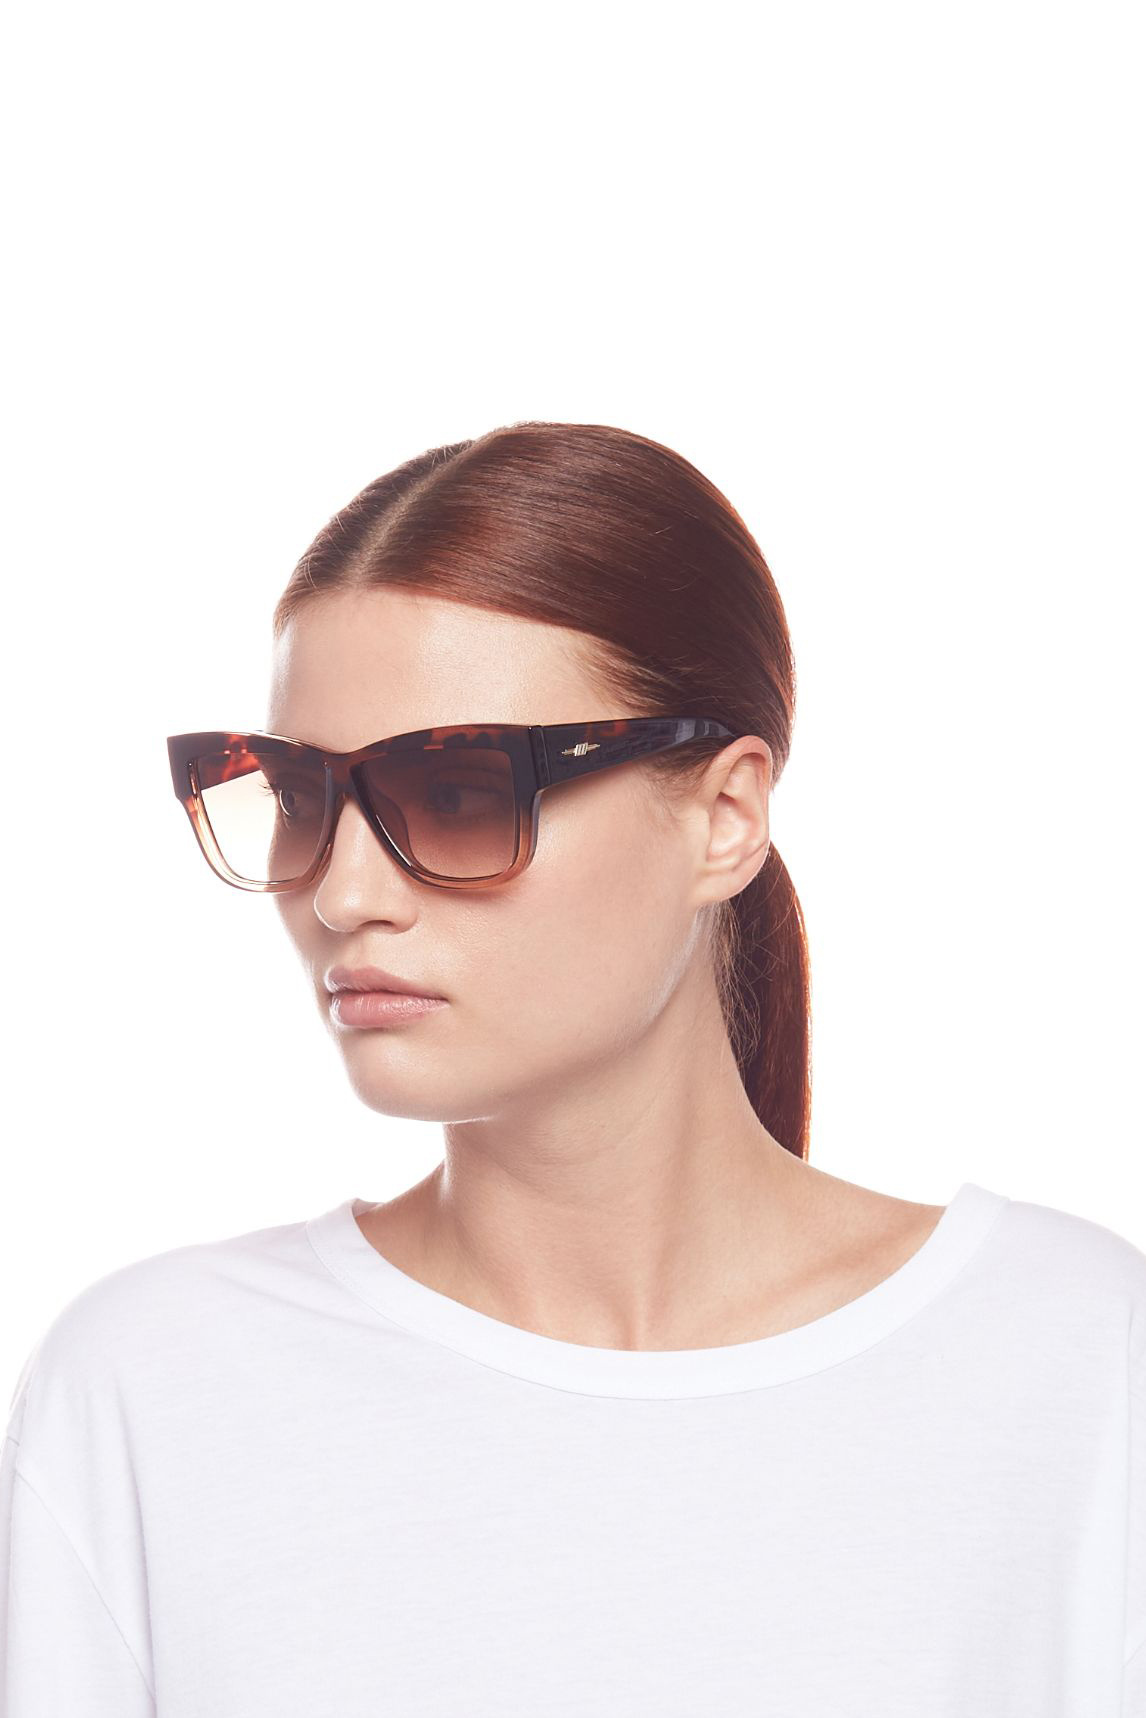 Total Eclipse Sunglasses - Tortoise Tan-4